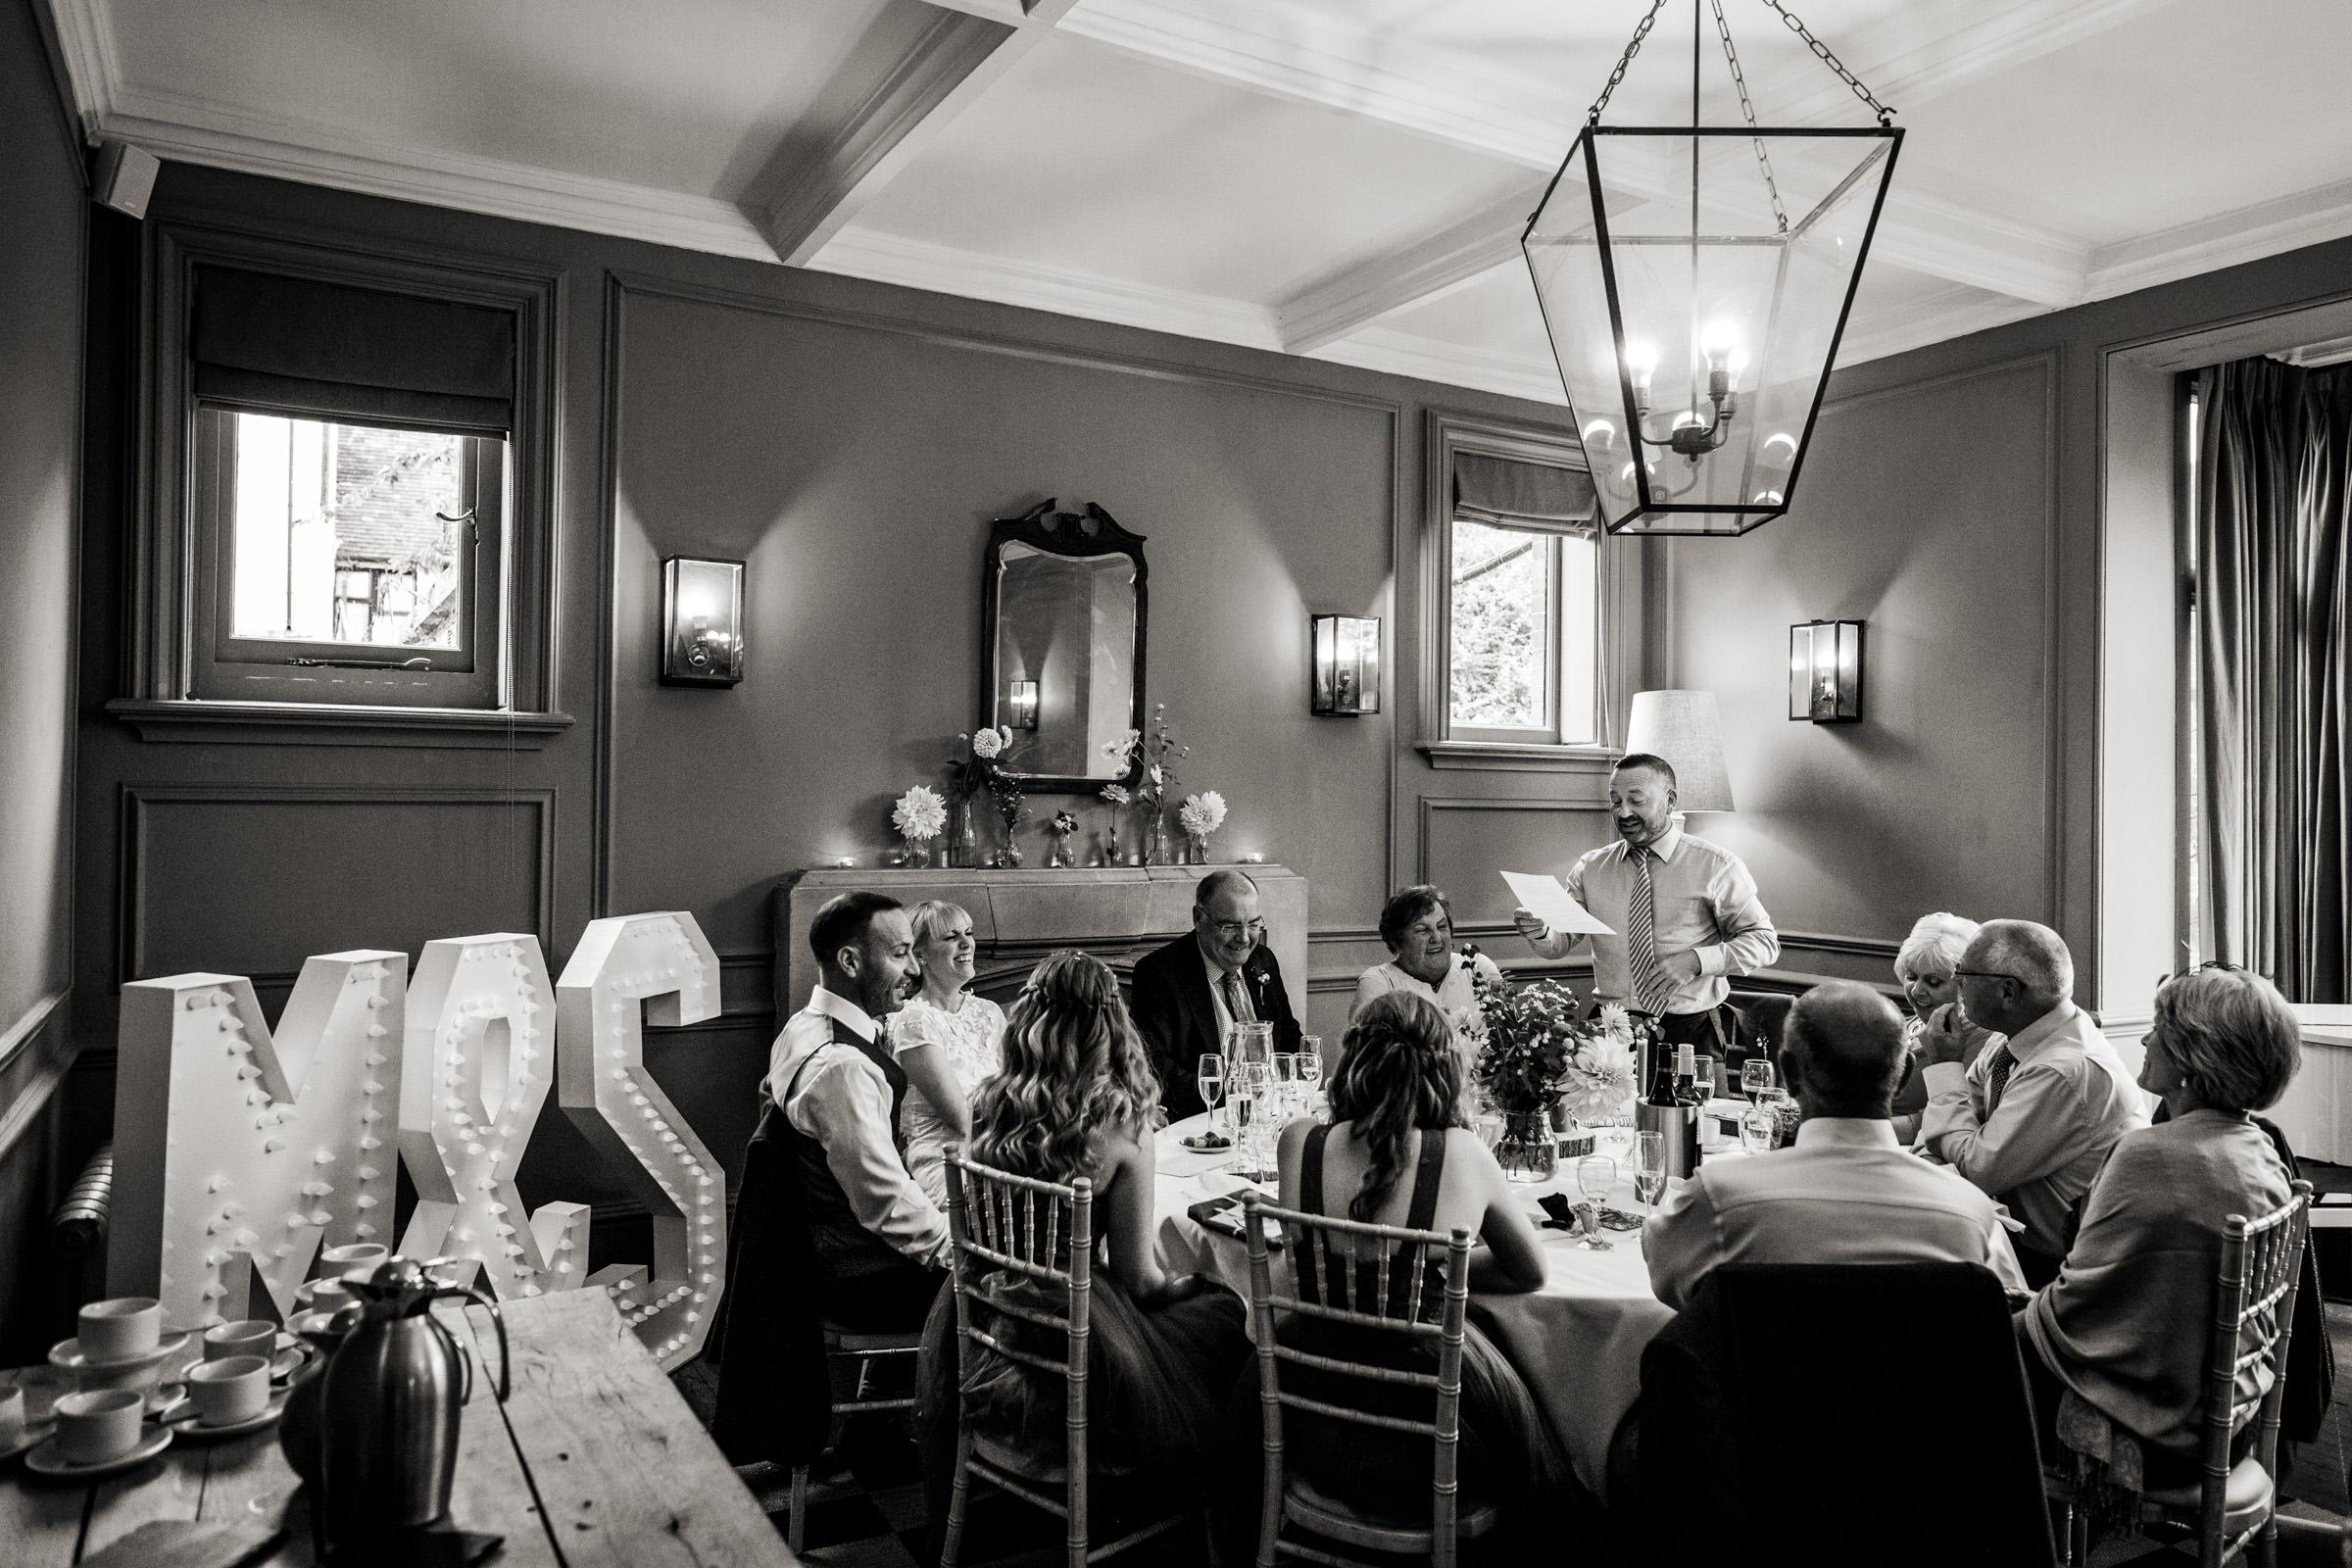 Wedding photos taken at The Olde Bell in Hurley 004.jpg